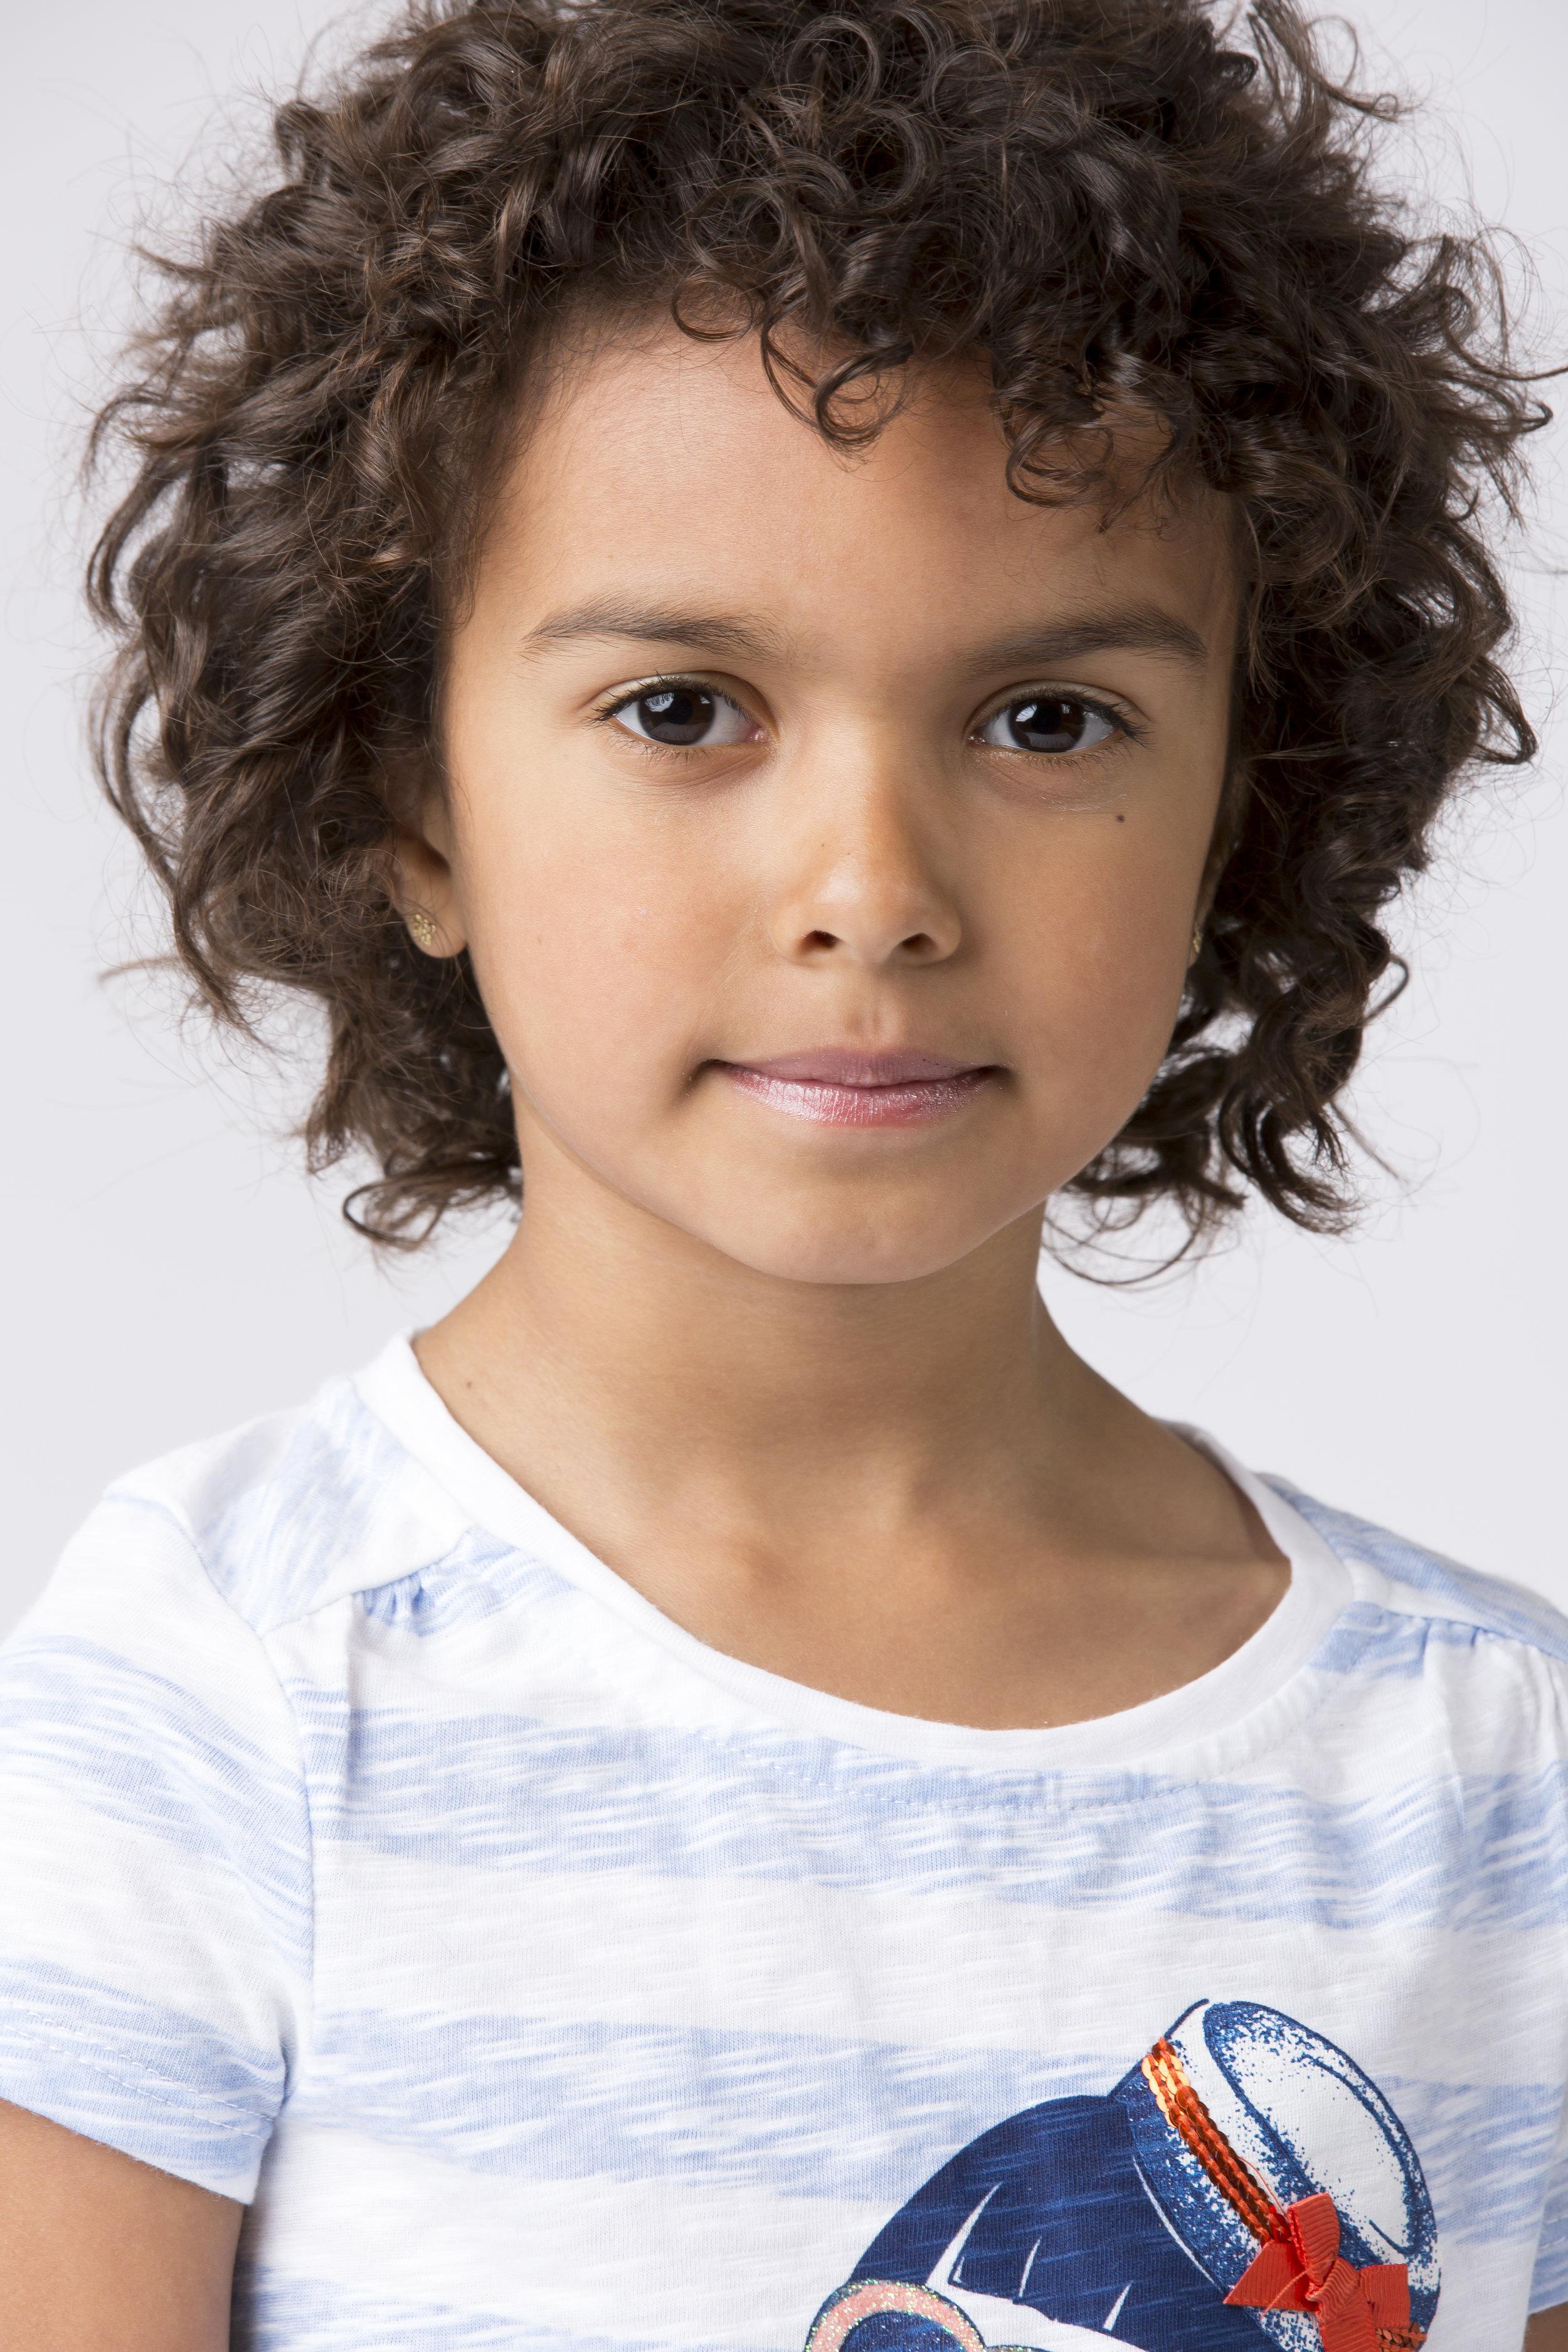 portland-or-vancouver-wa-child-kids-modeling-photography-portfolio-MA1